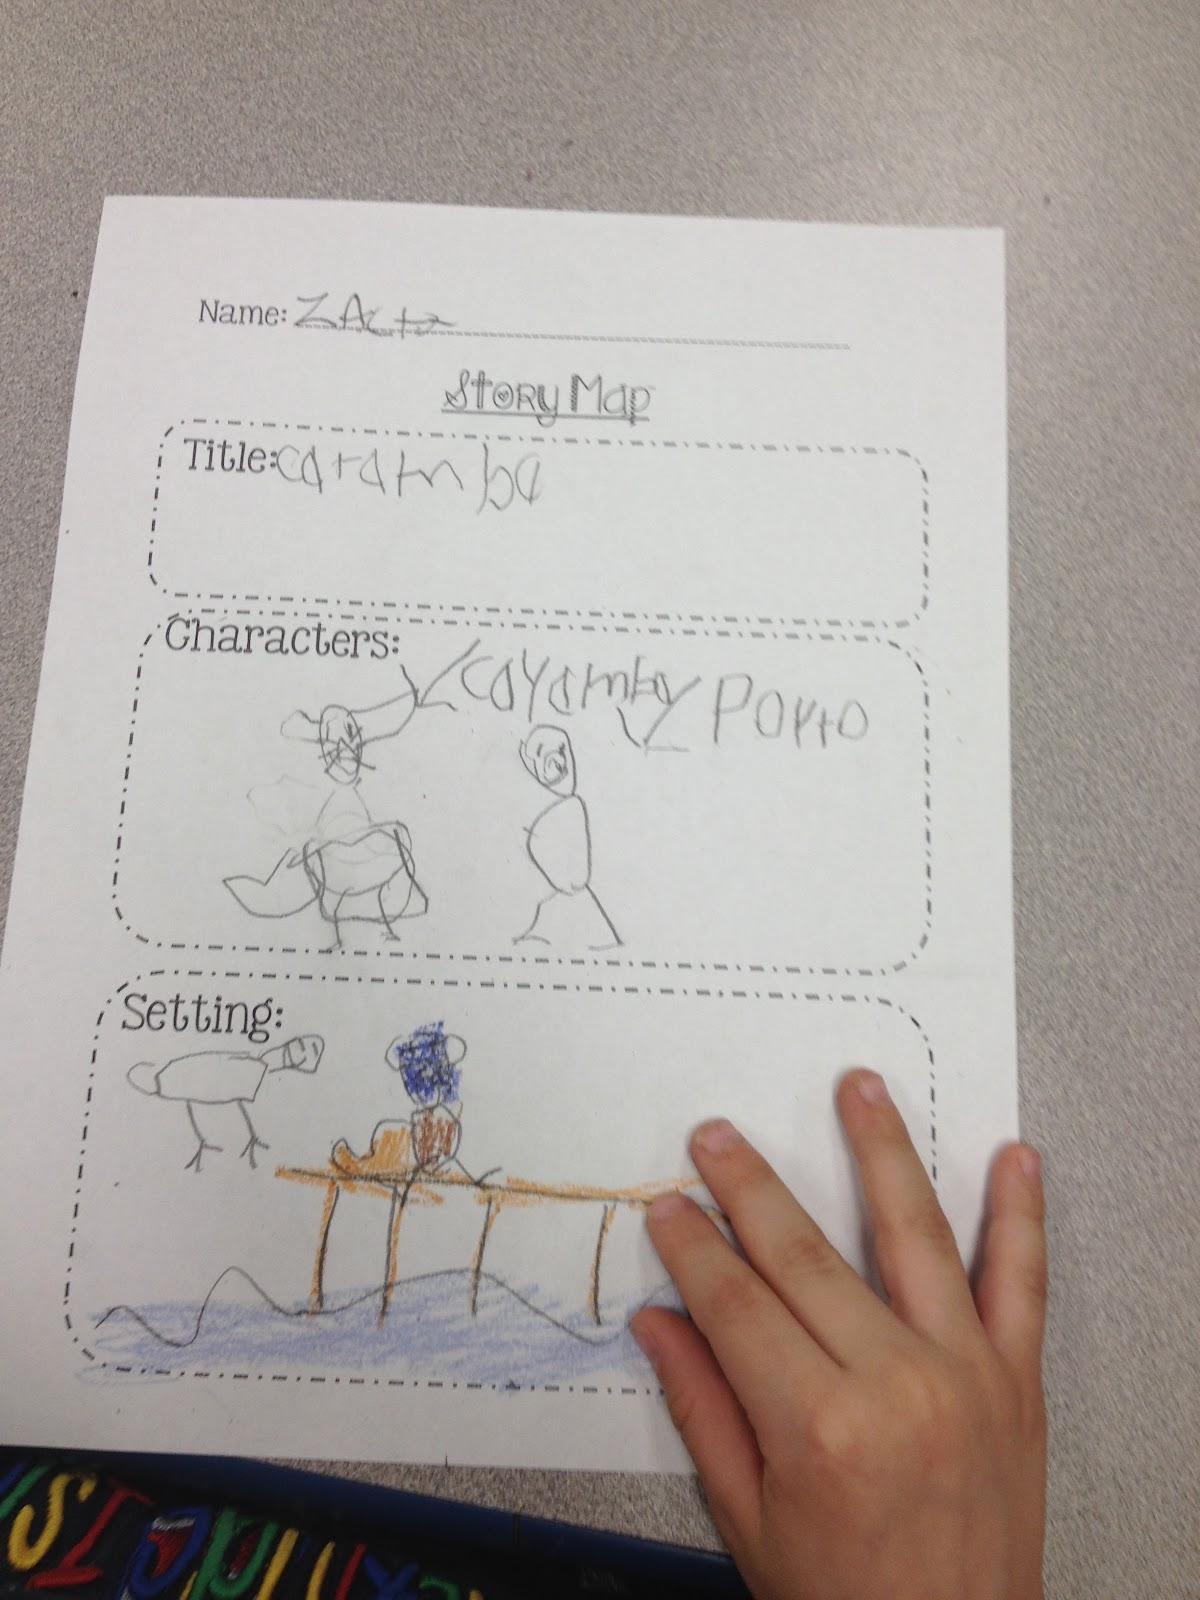 Confessions Of A Kinder Teacher Story Map A Kinder Kind